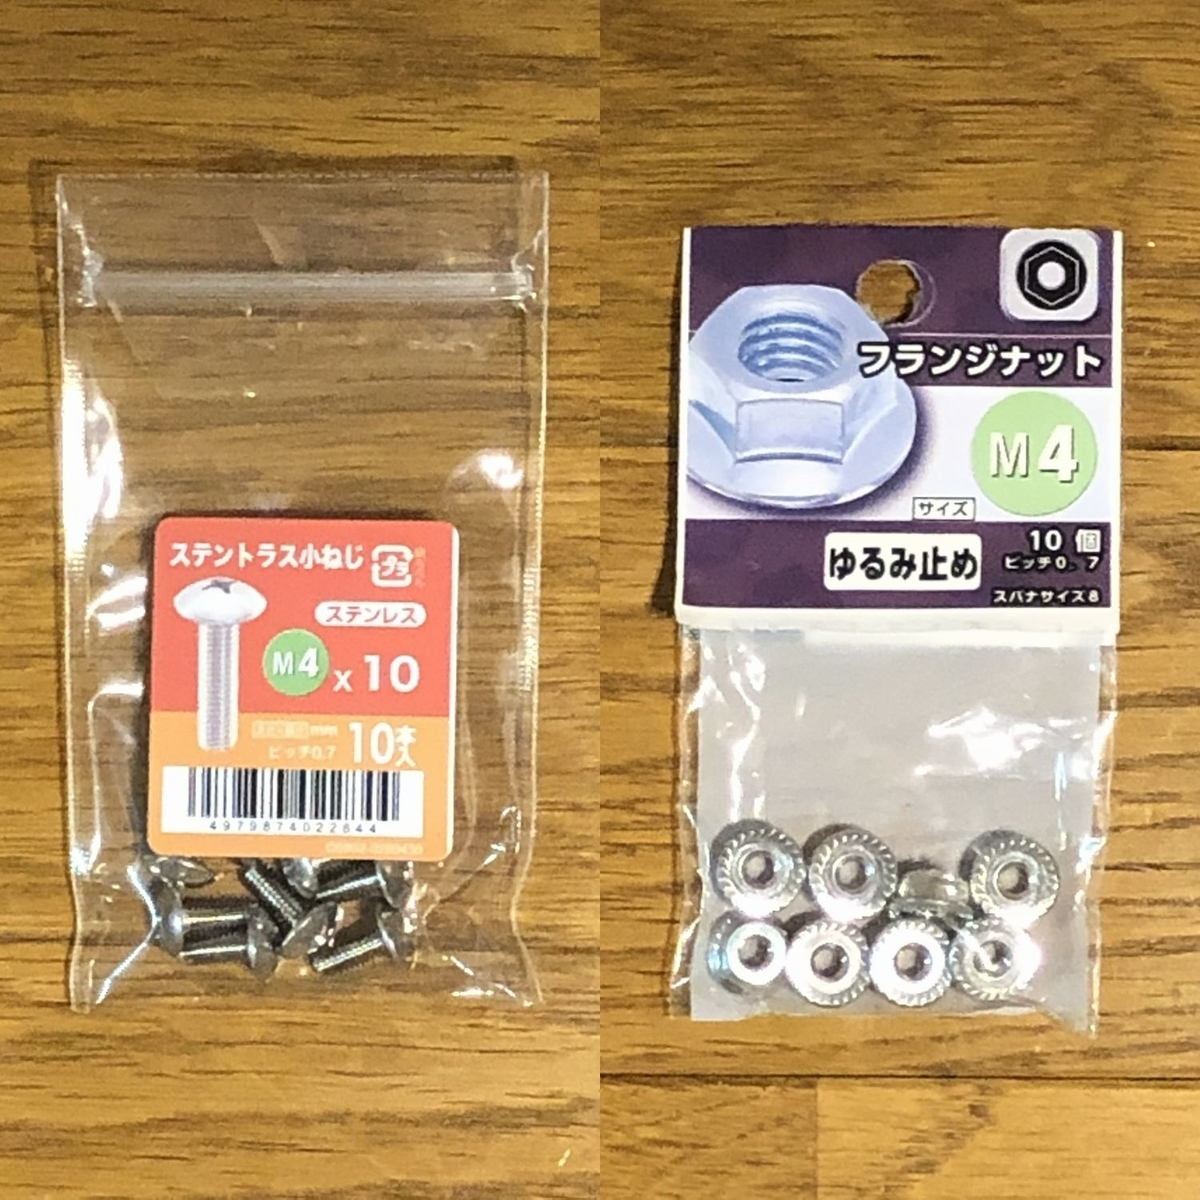 f:id:shiratsume:20200131105419j:plain